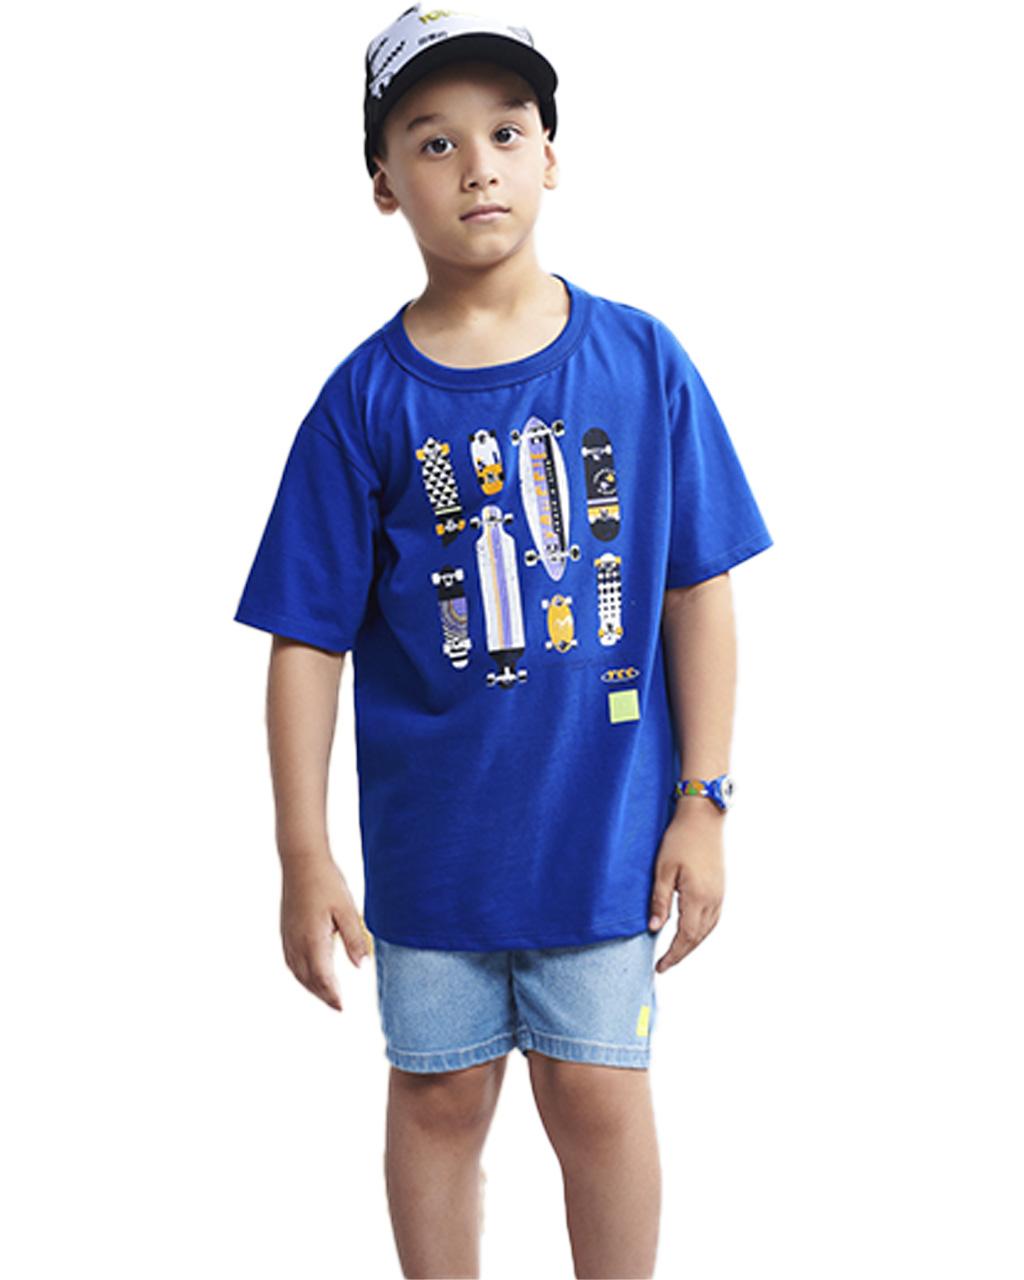 T-Shirt Infantil Skates Azul Royal Youccie